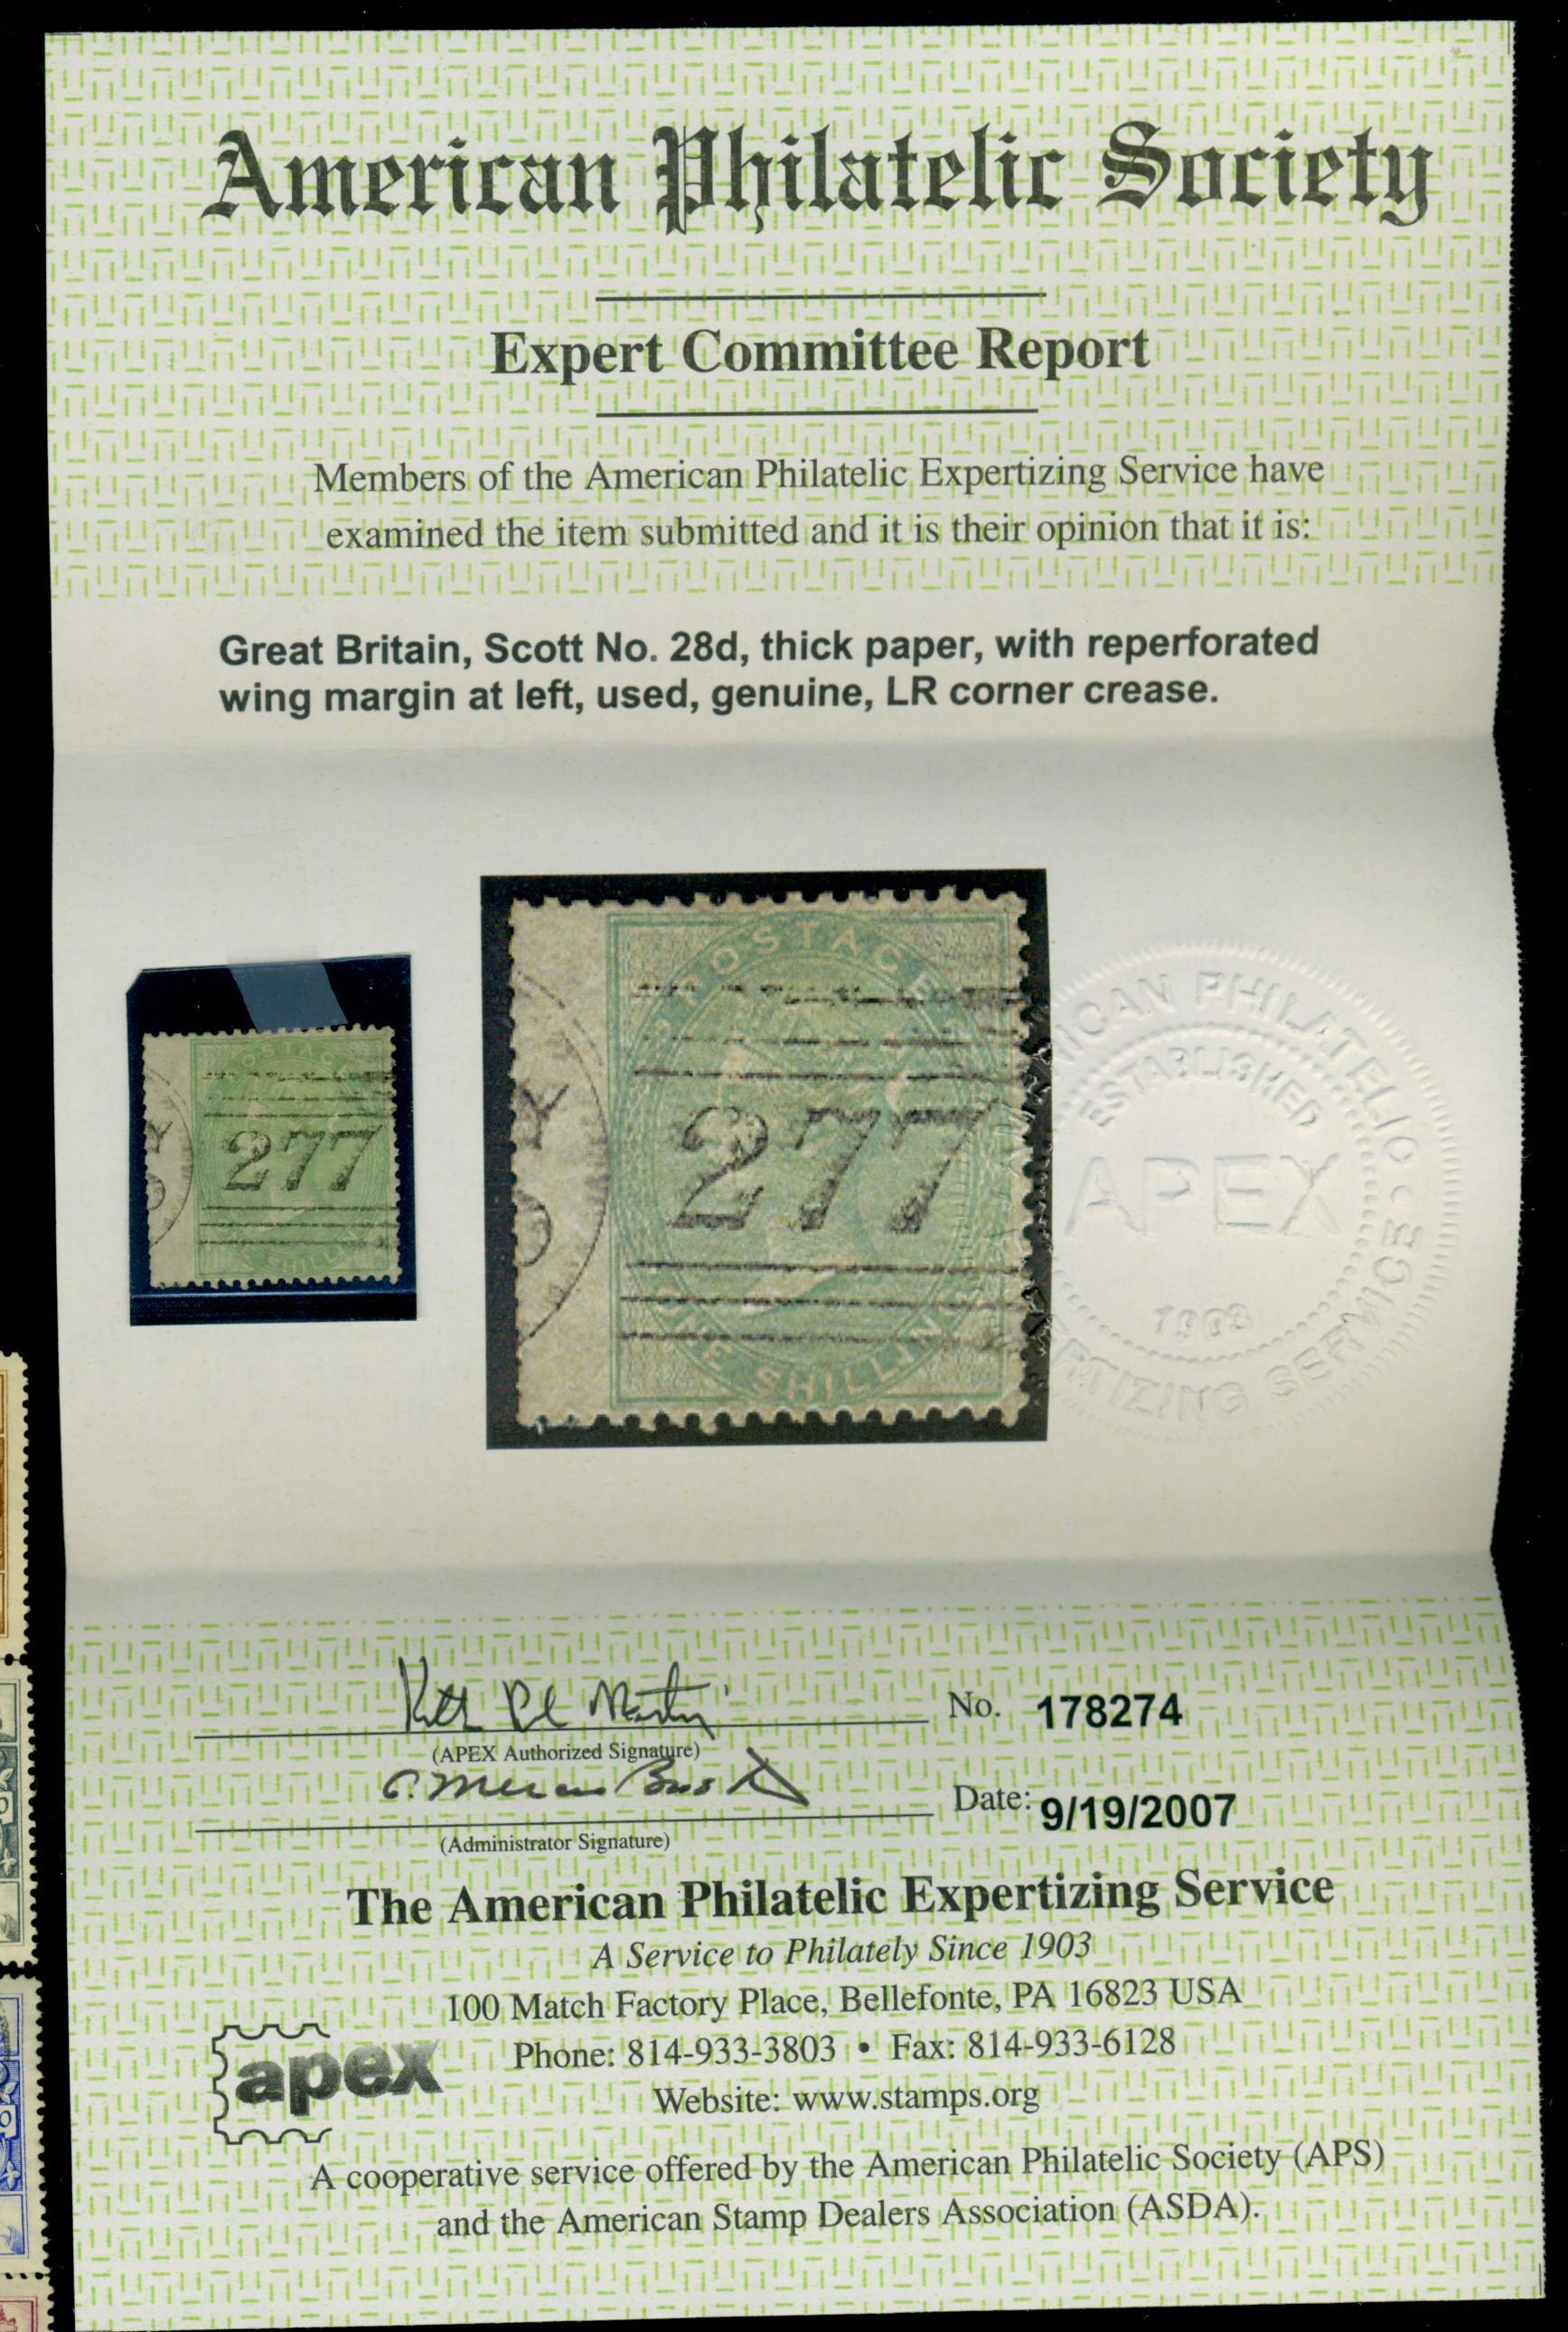 Great Britain #28d Used F-VF reperfed Corner crease Cat$325